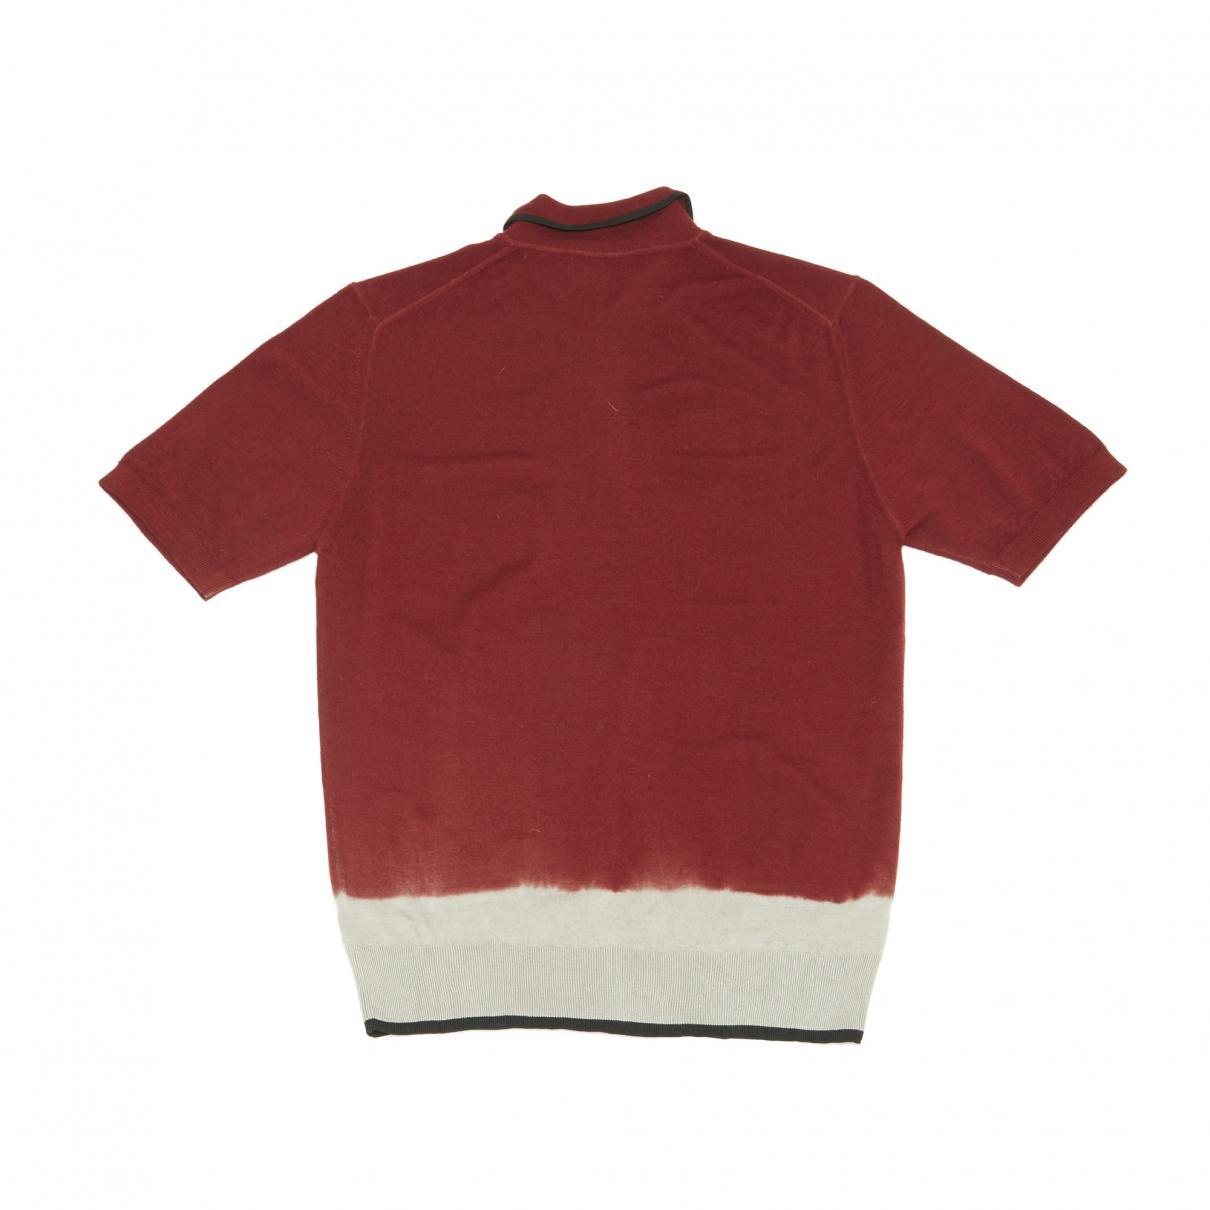 b8c1c190c Lanvin - Red Polo Shirt for Men - Lyst. View fullscreen